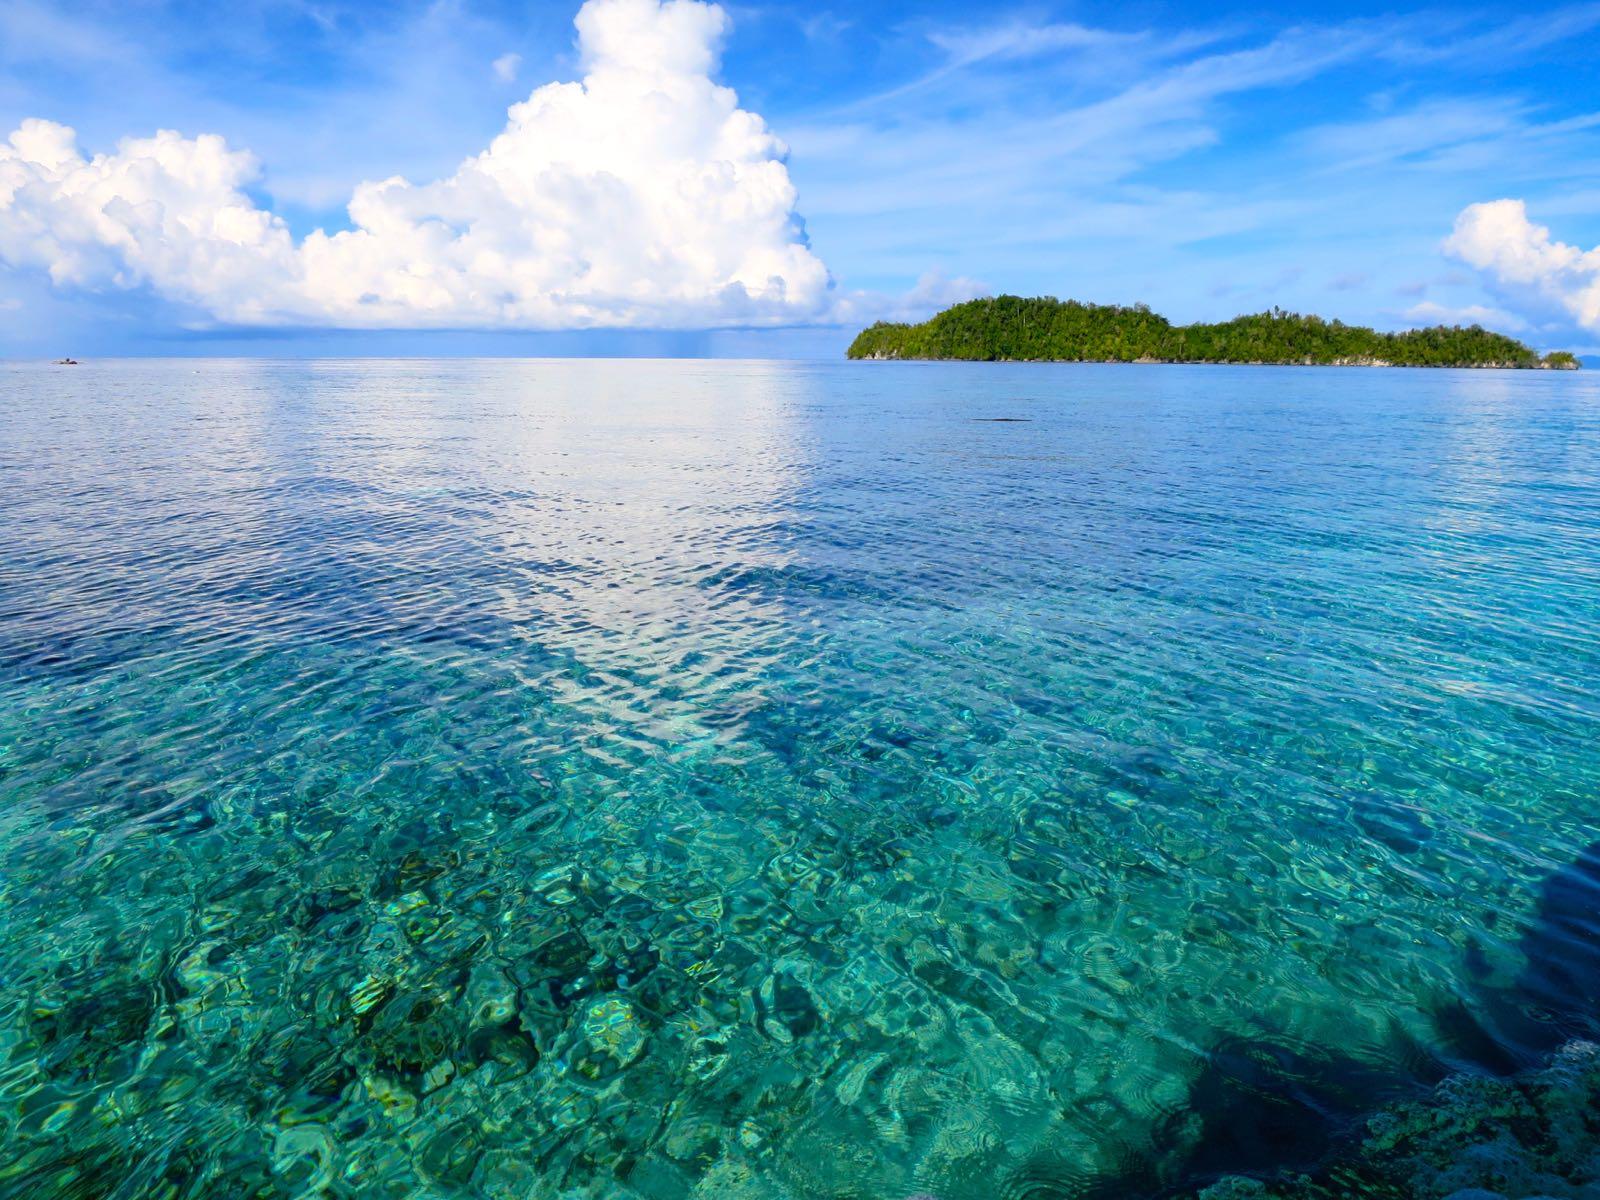 Korallimerta